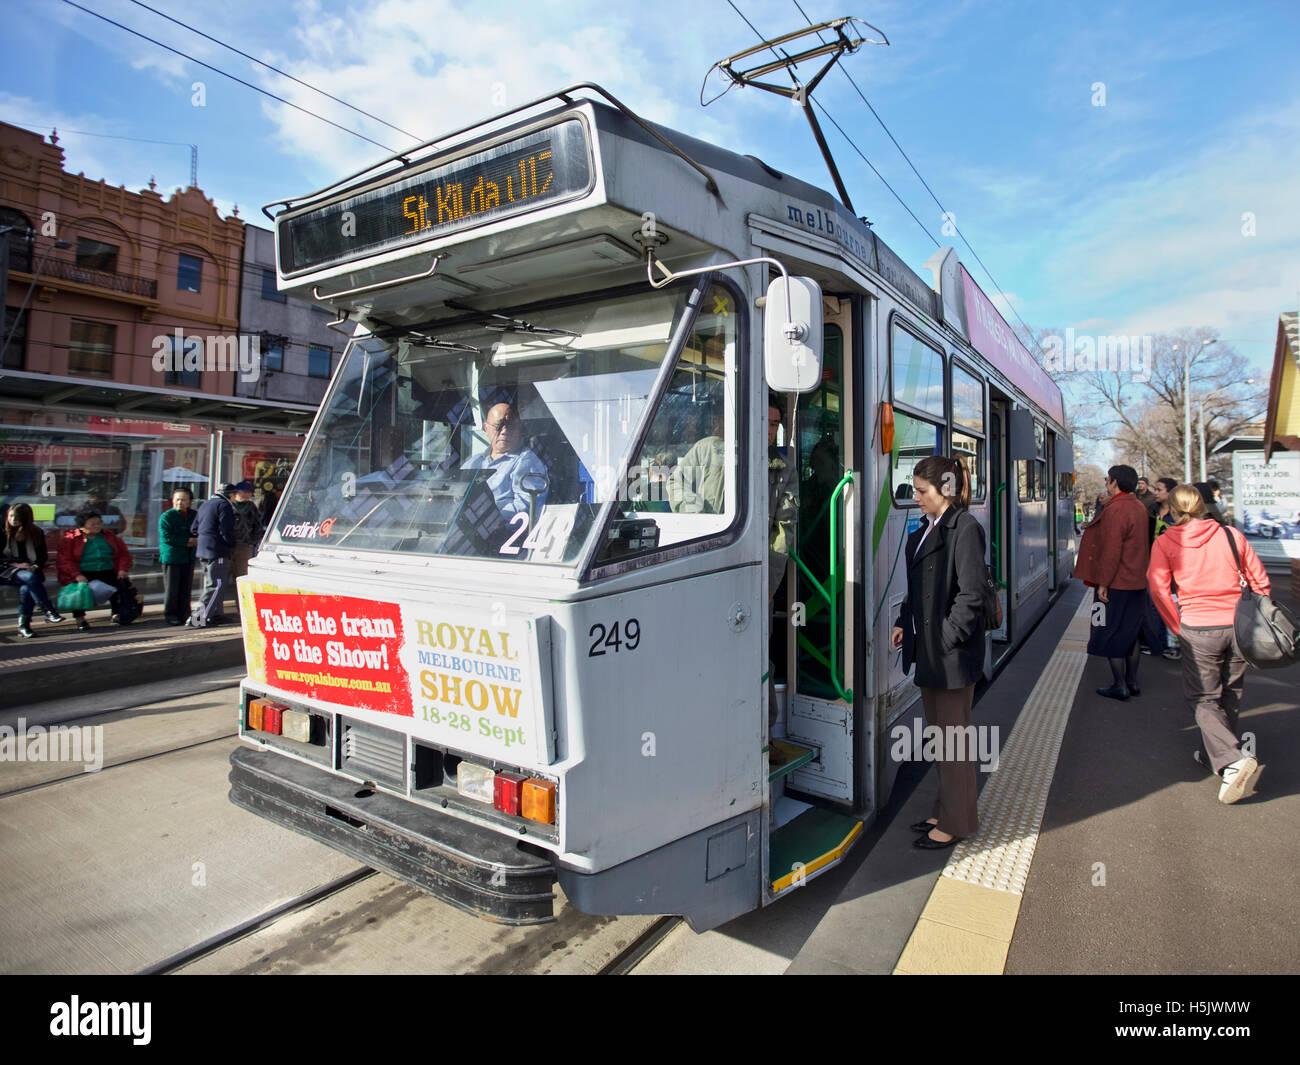 St Kilda tram at St Kilda shopping area in Melbourne, Australia  A major form of public transport in Melbourne Stock Photo